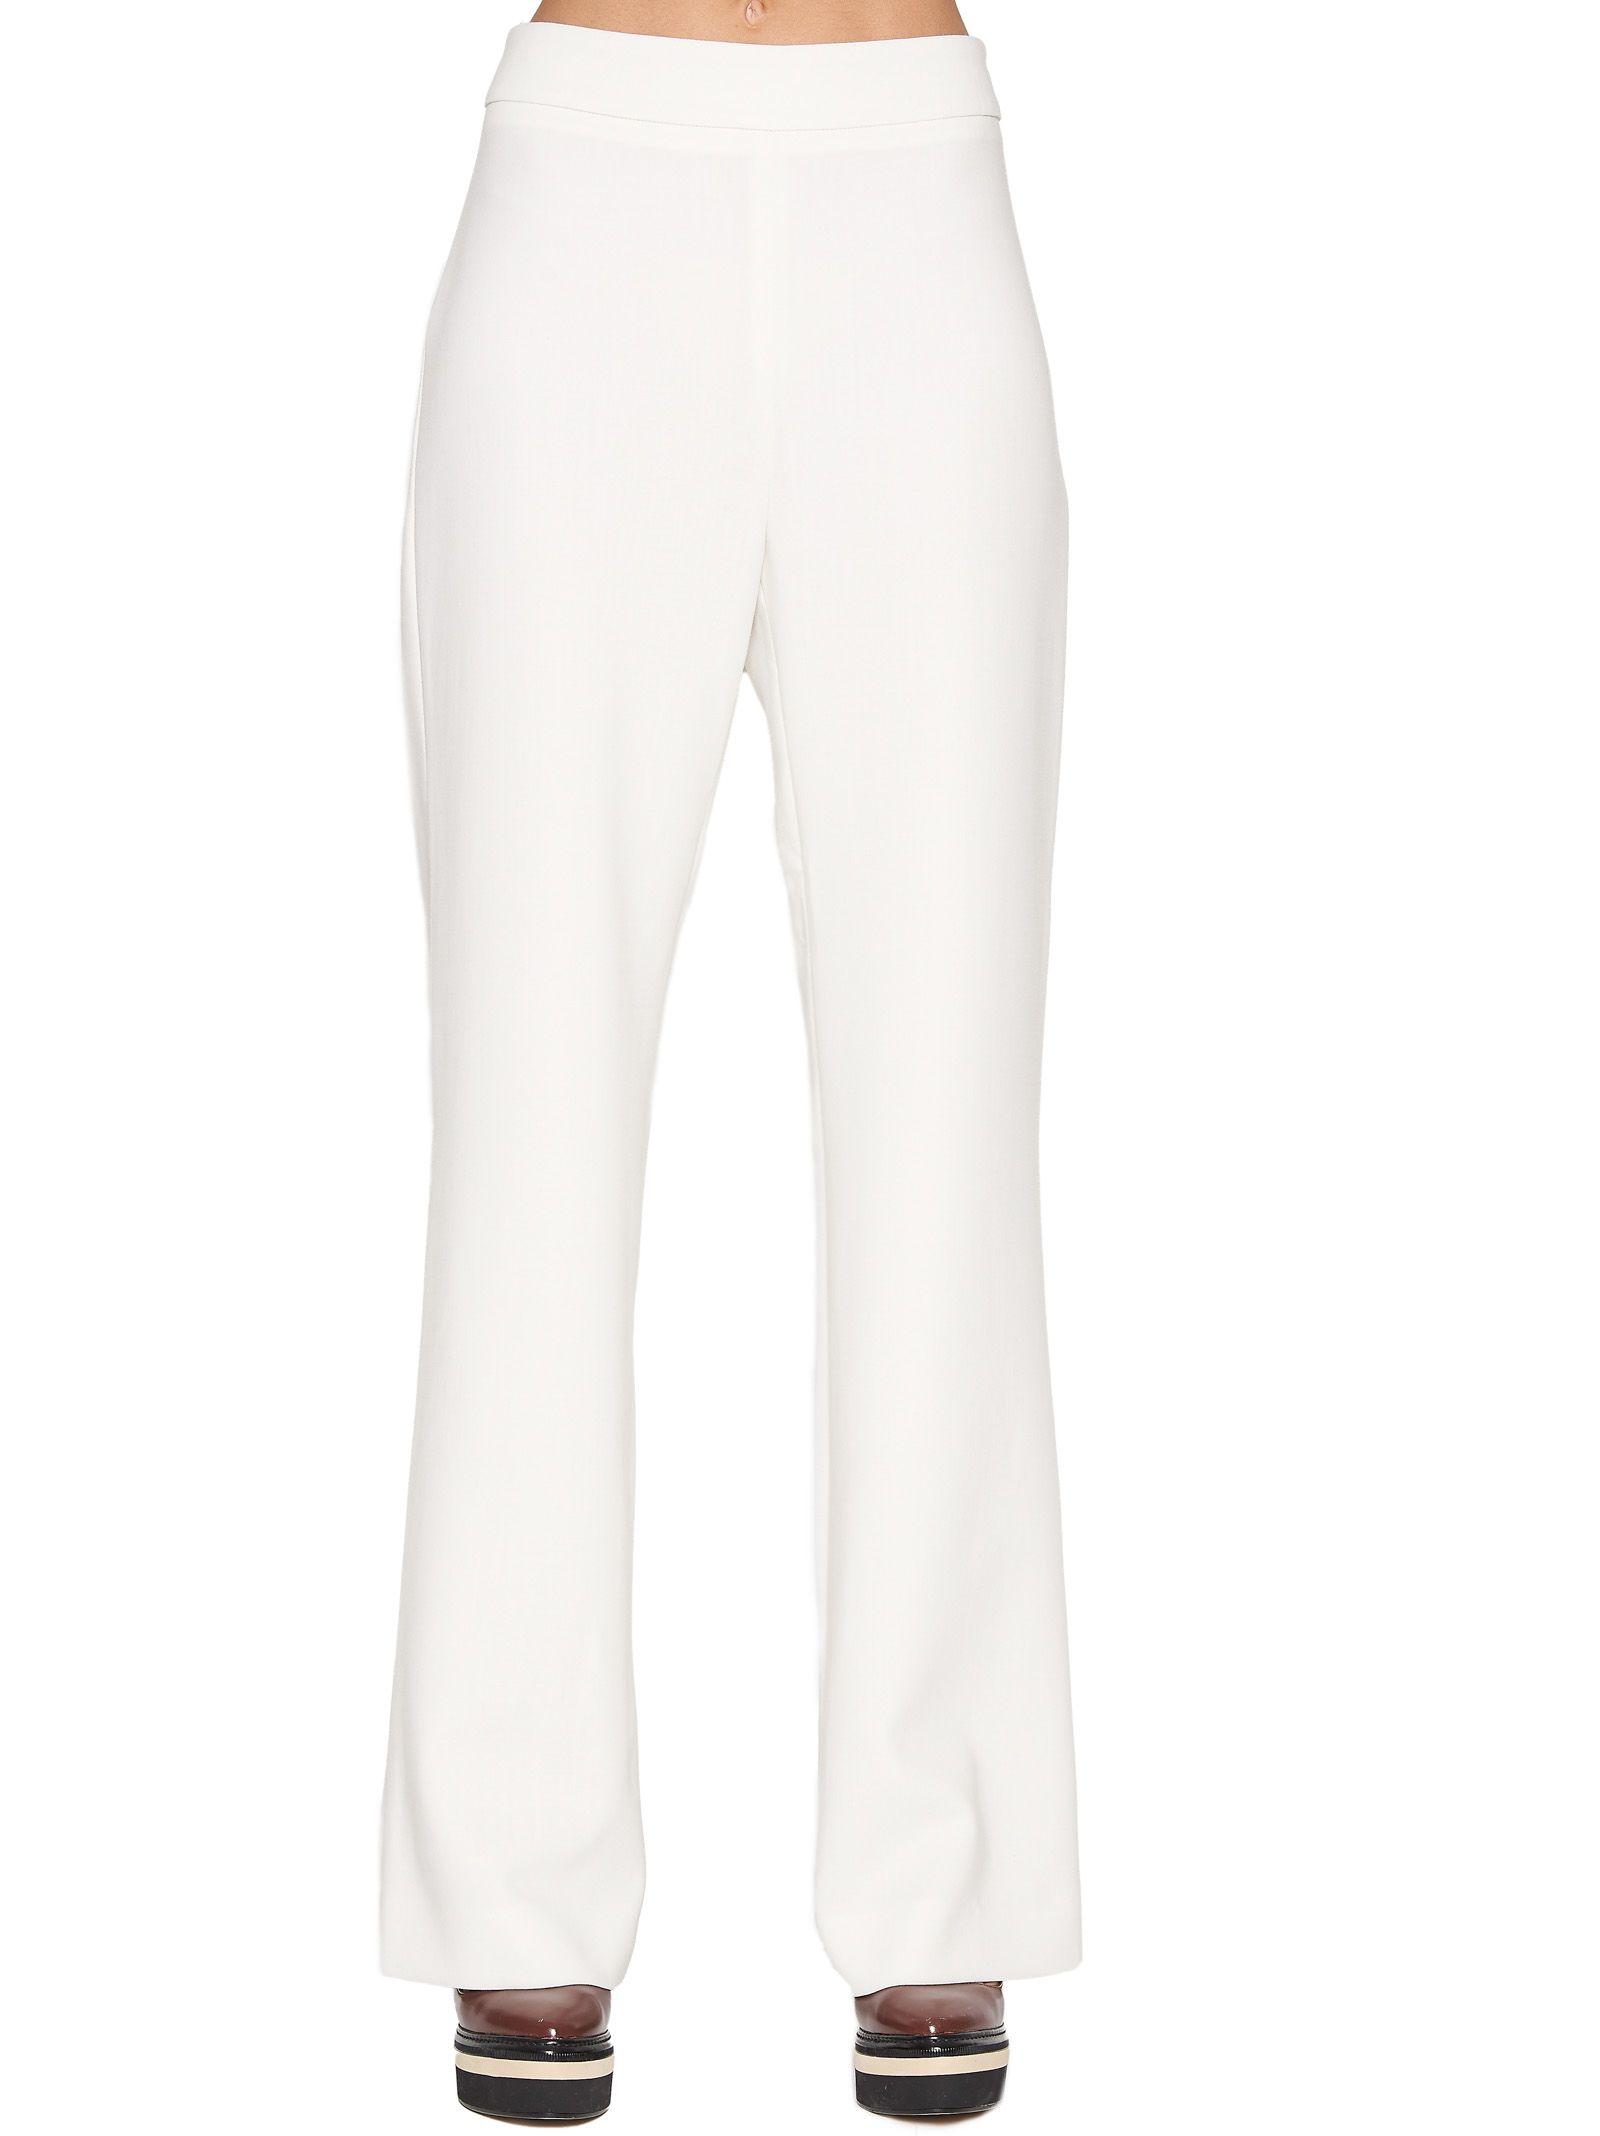 Max Mara Trousers